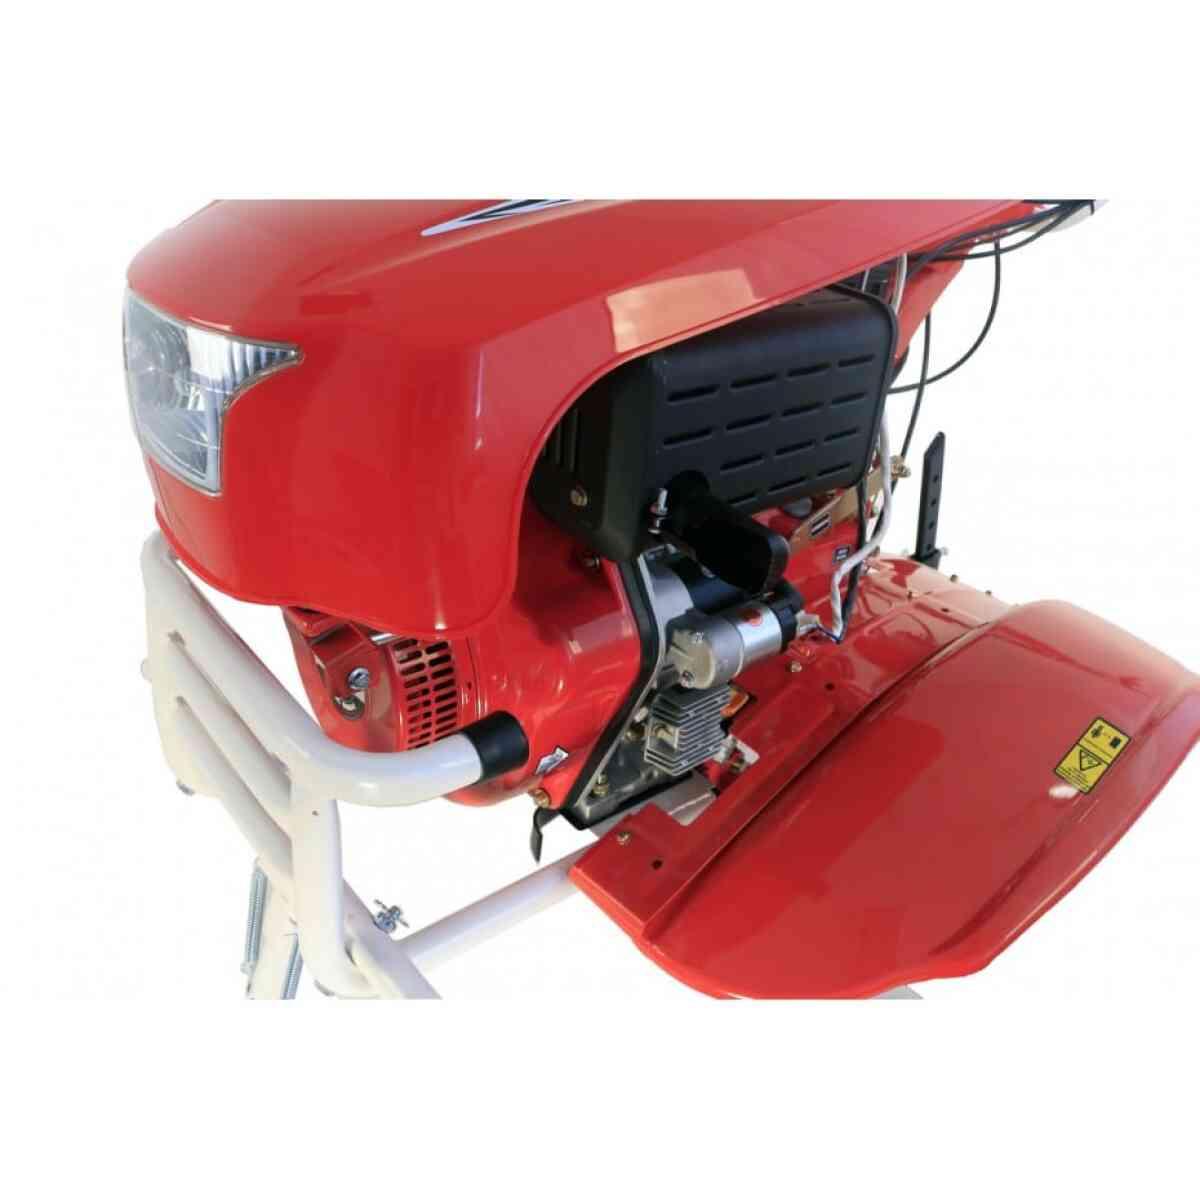 motocultor pro series new 1350 s o mac.ro 2 1 4